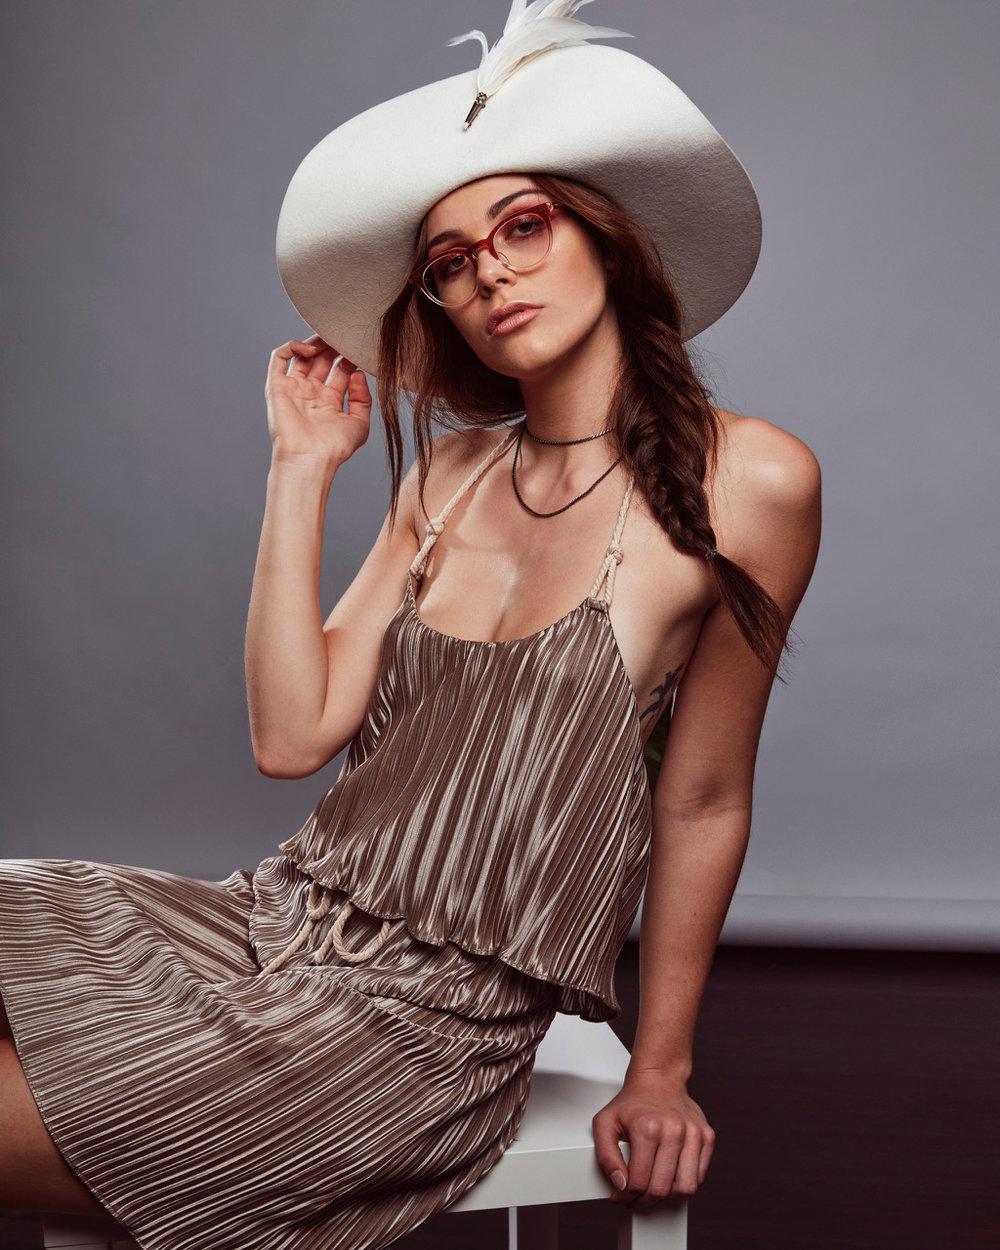 Photographer: Sergio Necoechea | Model: Ashley Warters | Styling: Landra Dulin | Hair & Makeup by Ashley Tani